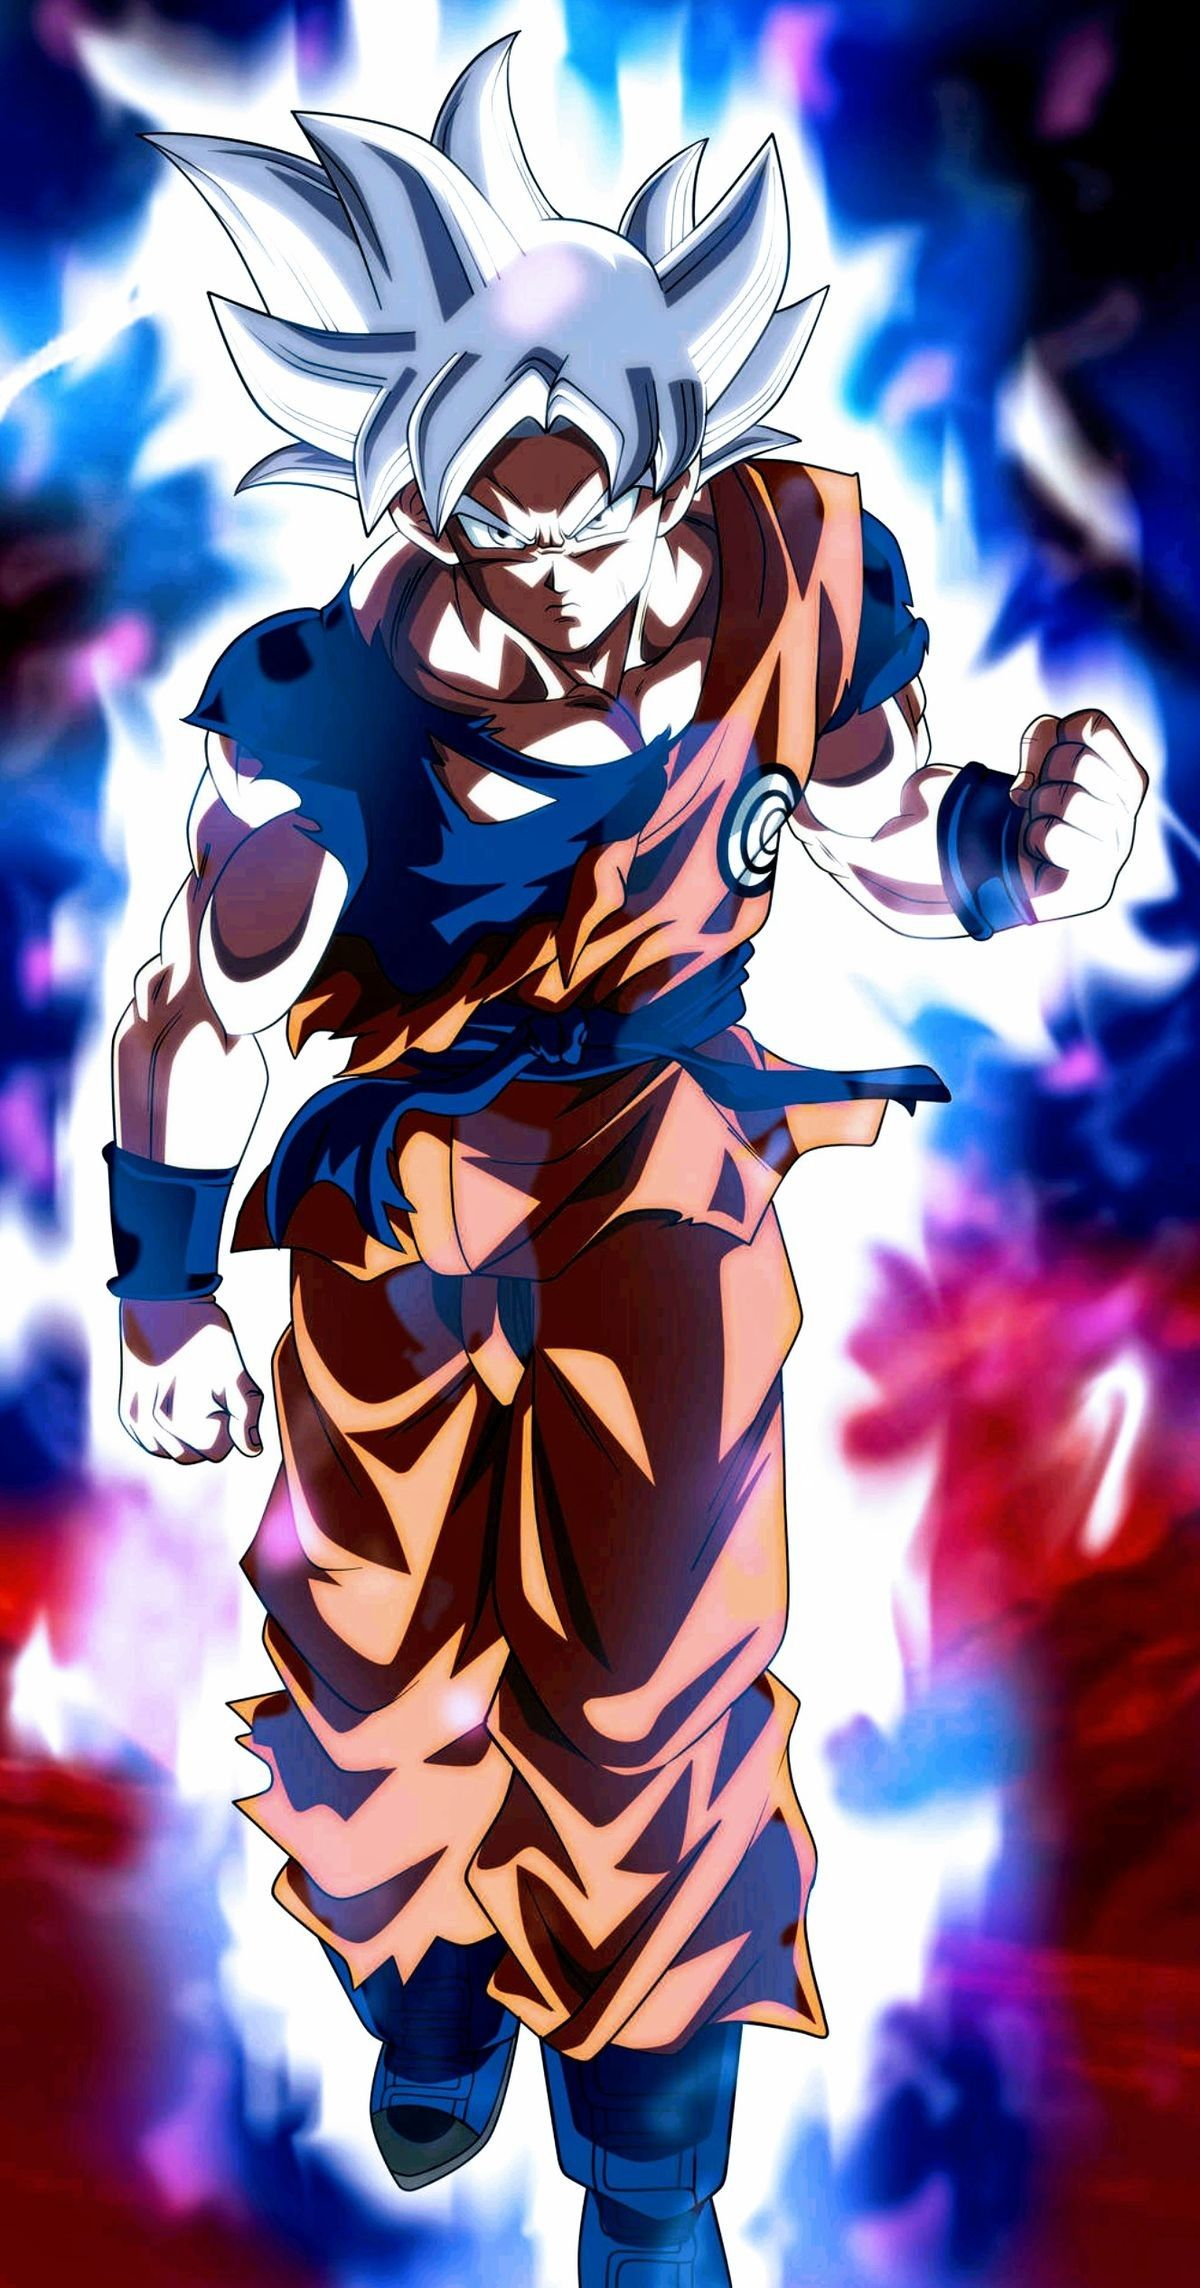 Iphone X Xr Xs 6 7 8 Plus Flexible Slim Tpu Protector Cover Silver Goku Anime Dragon Ball Super Anime Dragon Ball Dragon Ball Super Artwork